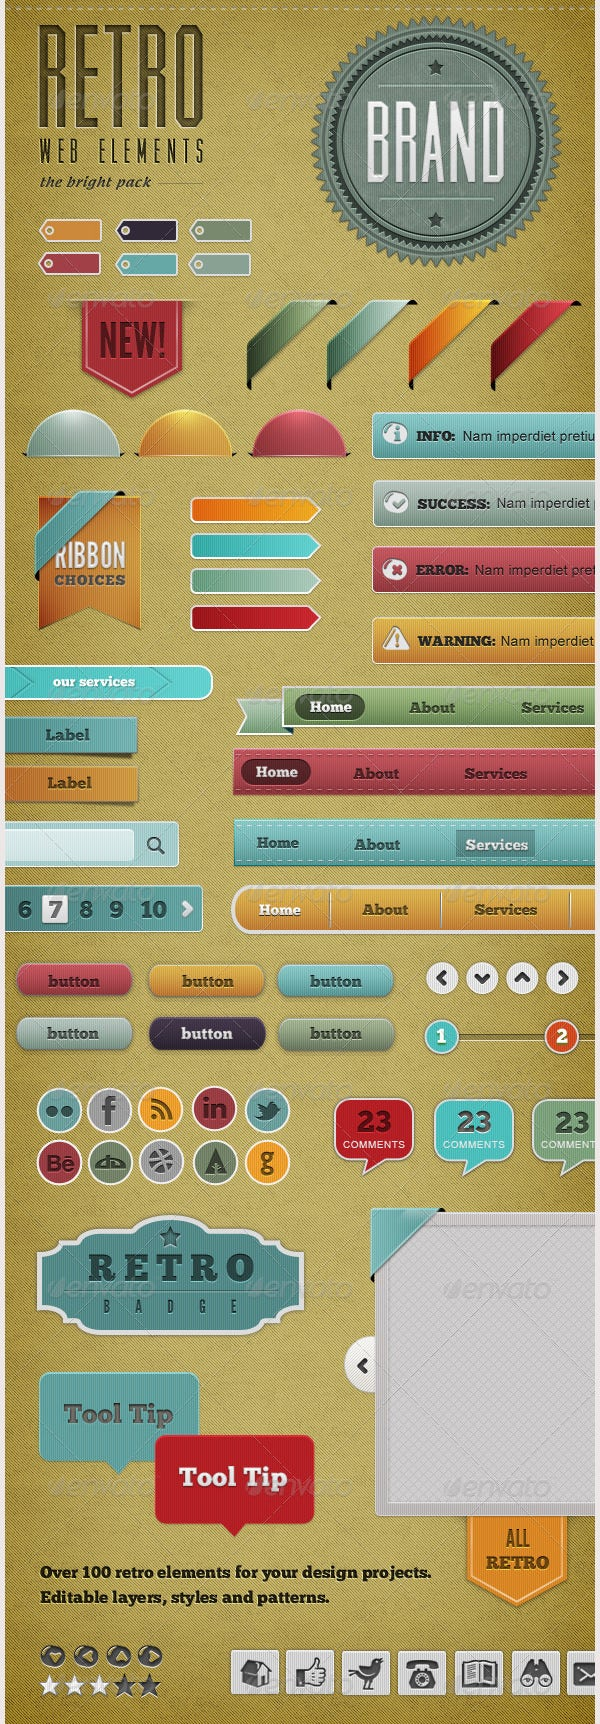 retro web elements0